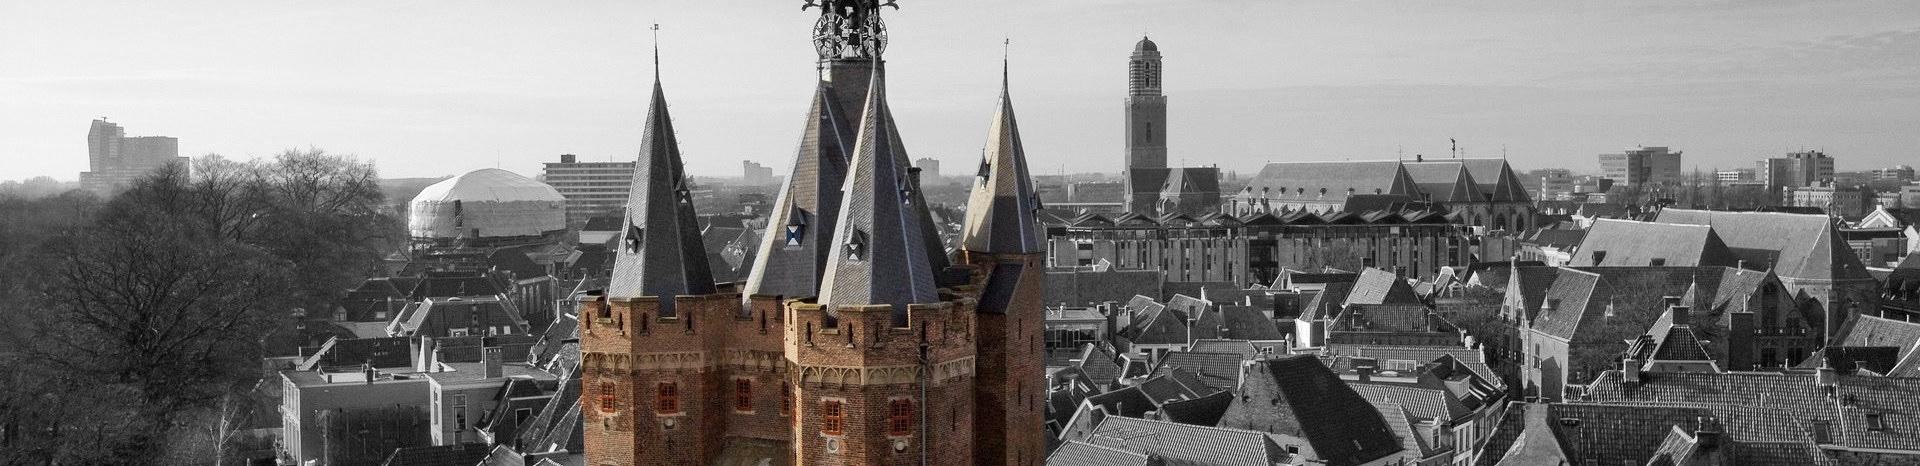 Letselschade advocaat Zwolle | LetselPro